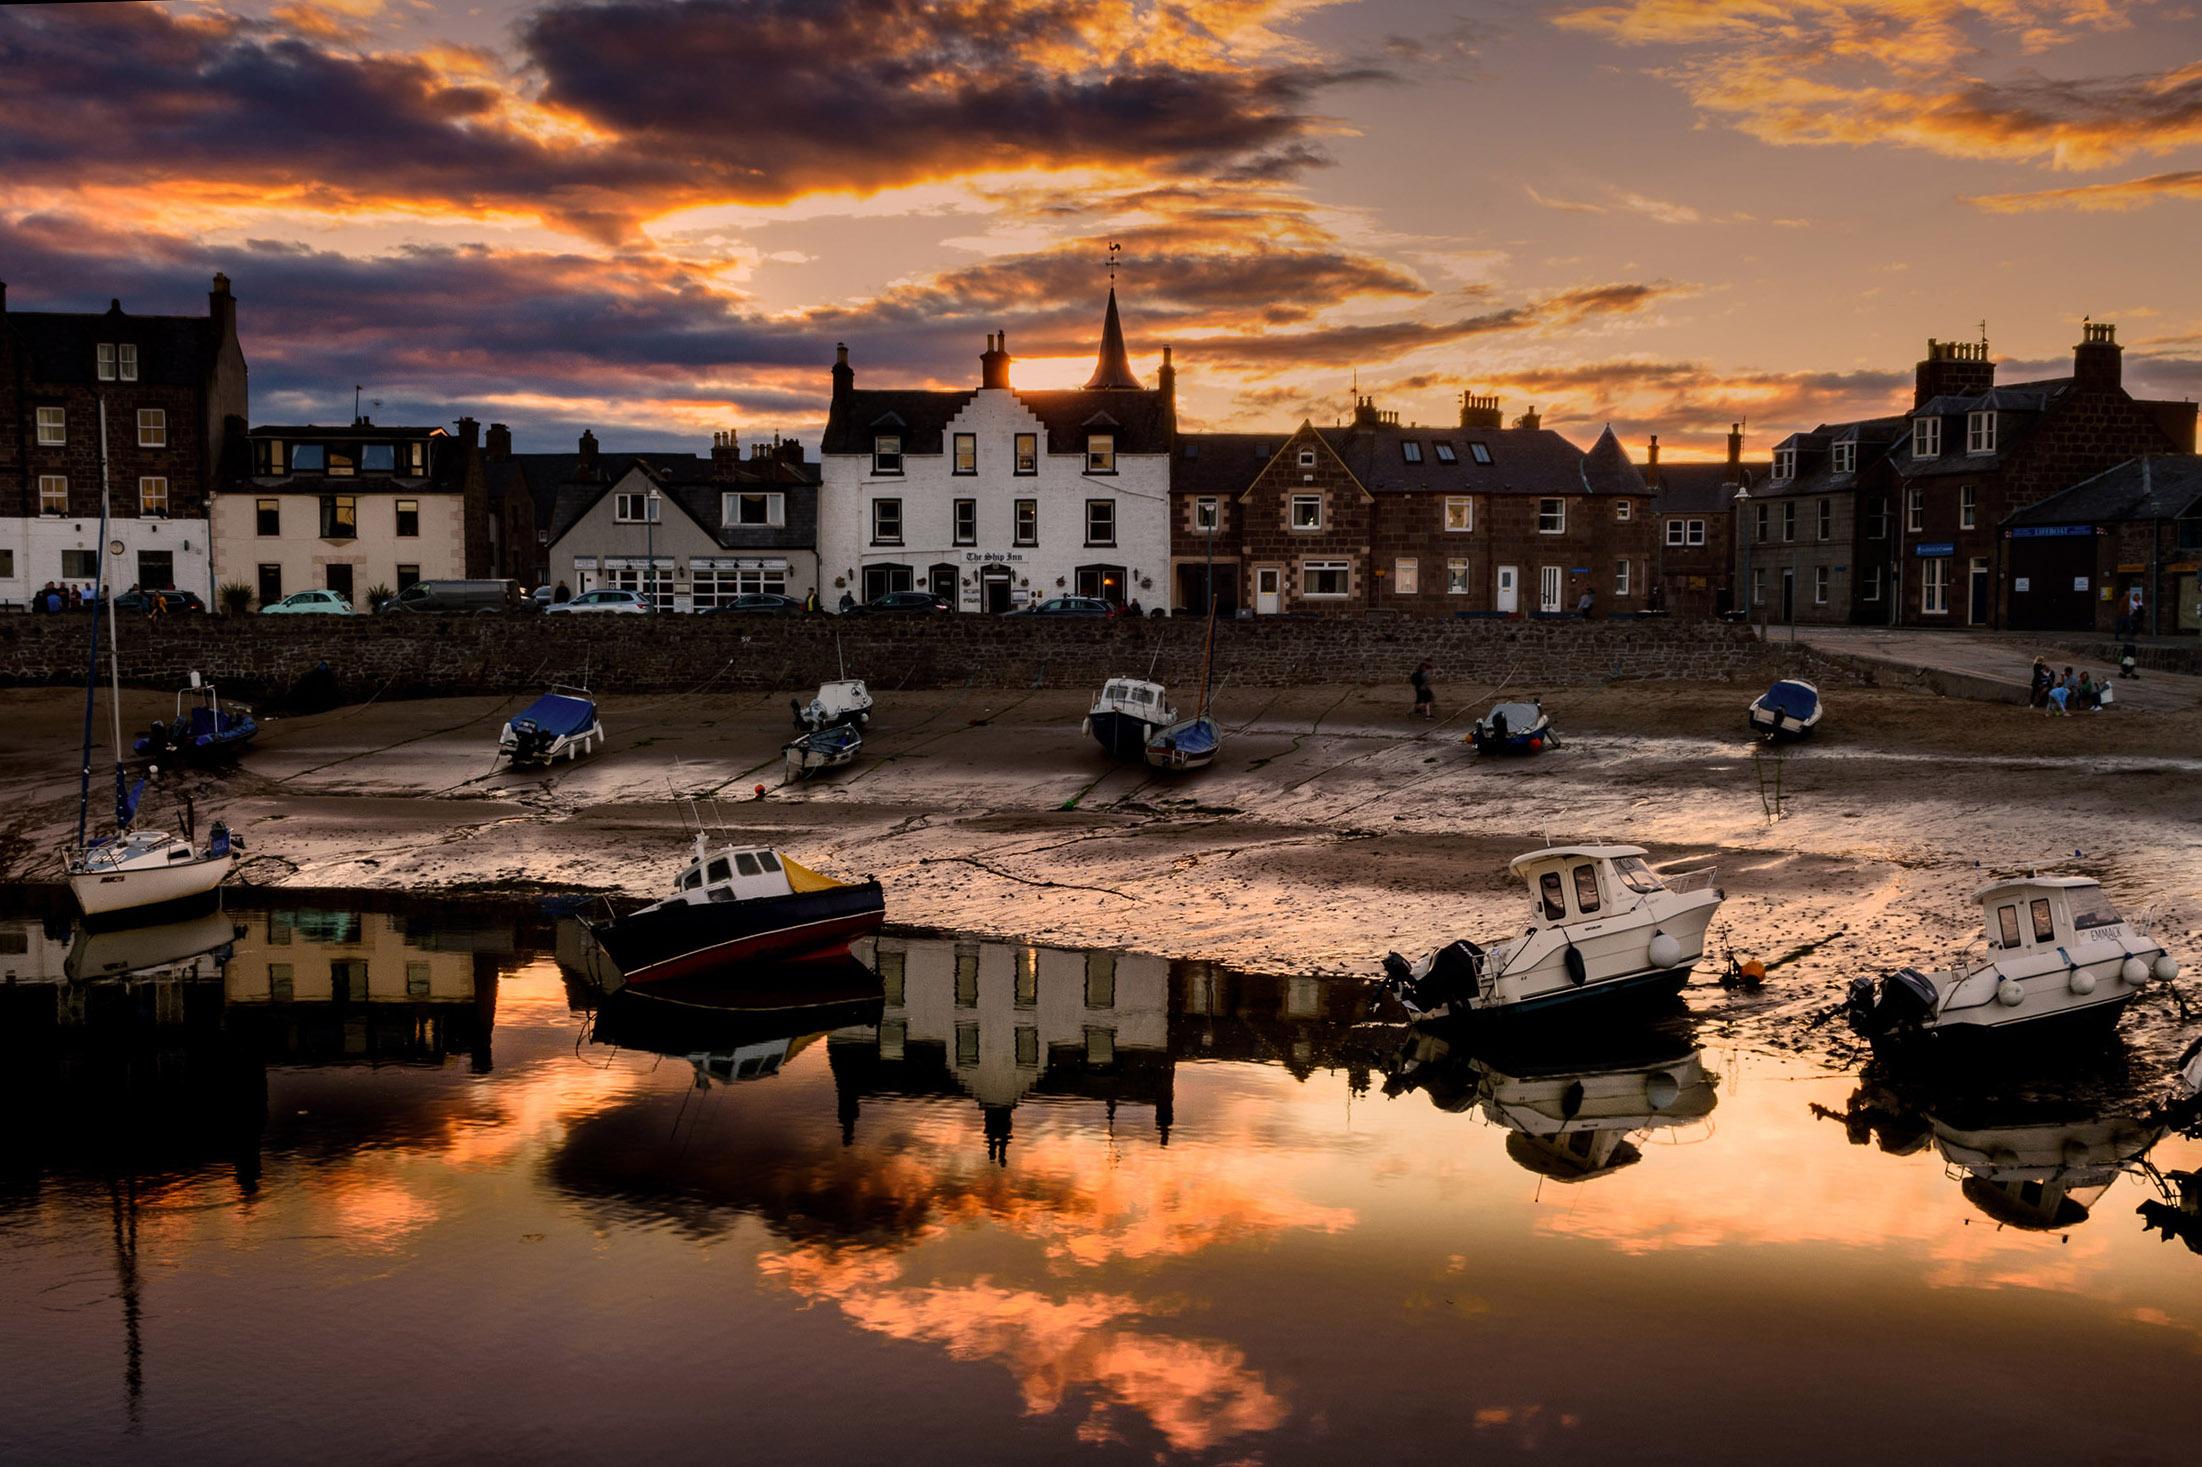 Low tide evening...